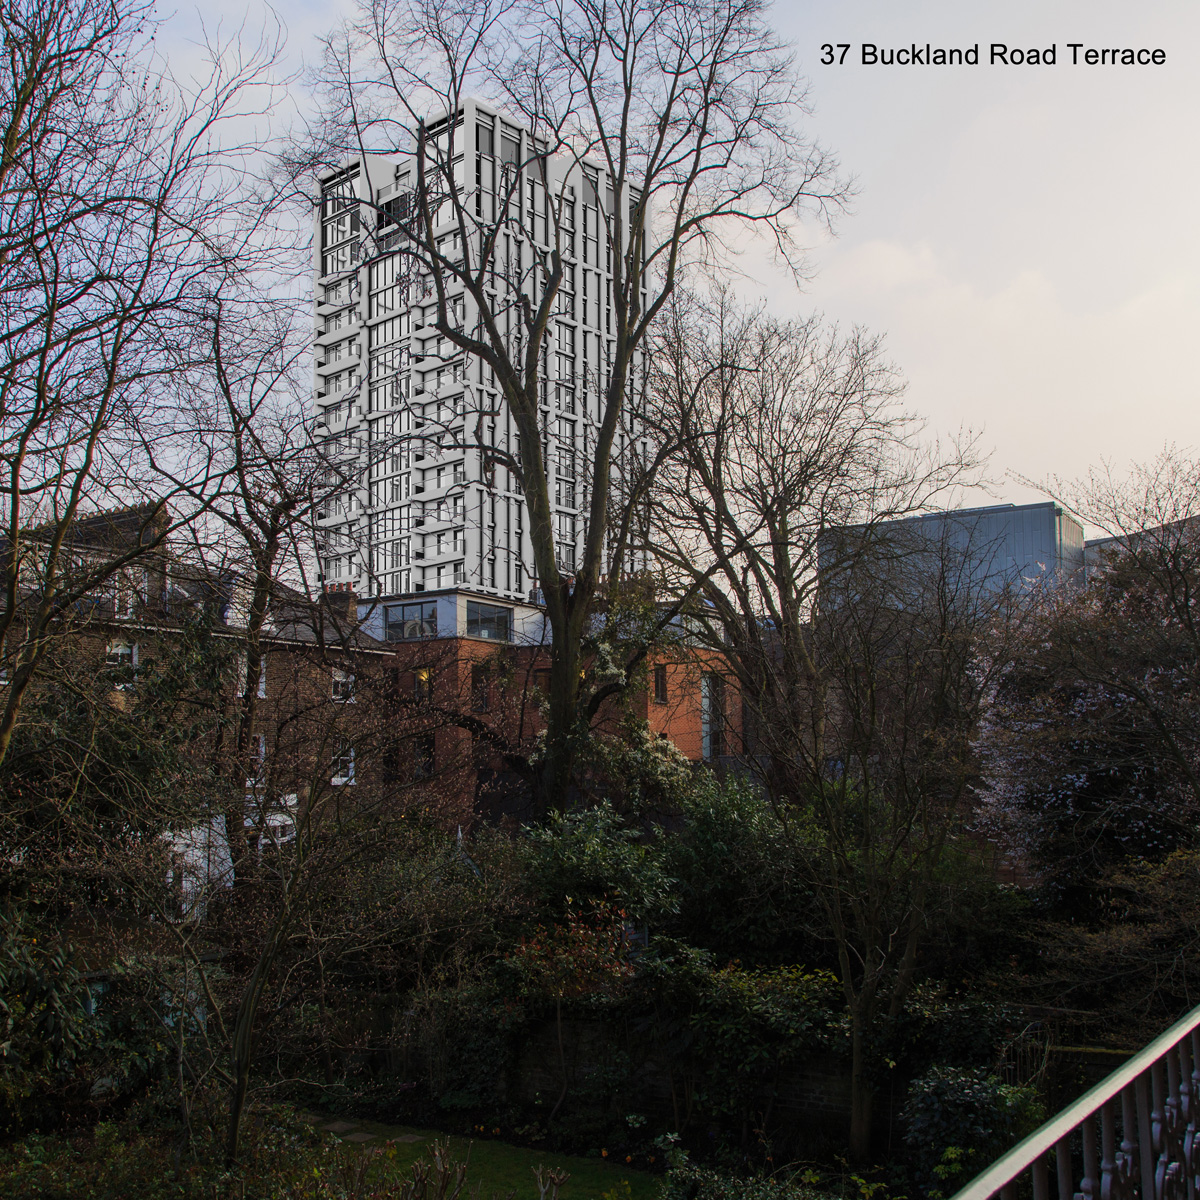 8 - 37 Buckland Road Terrace  grey model.jpg